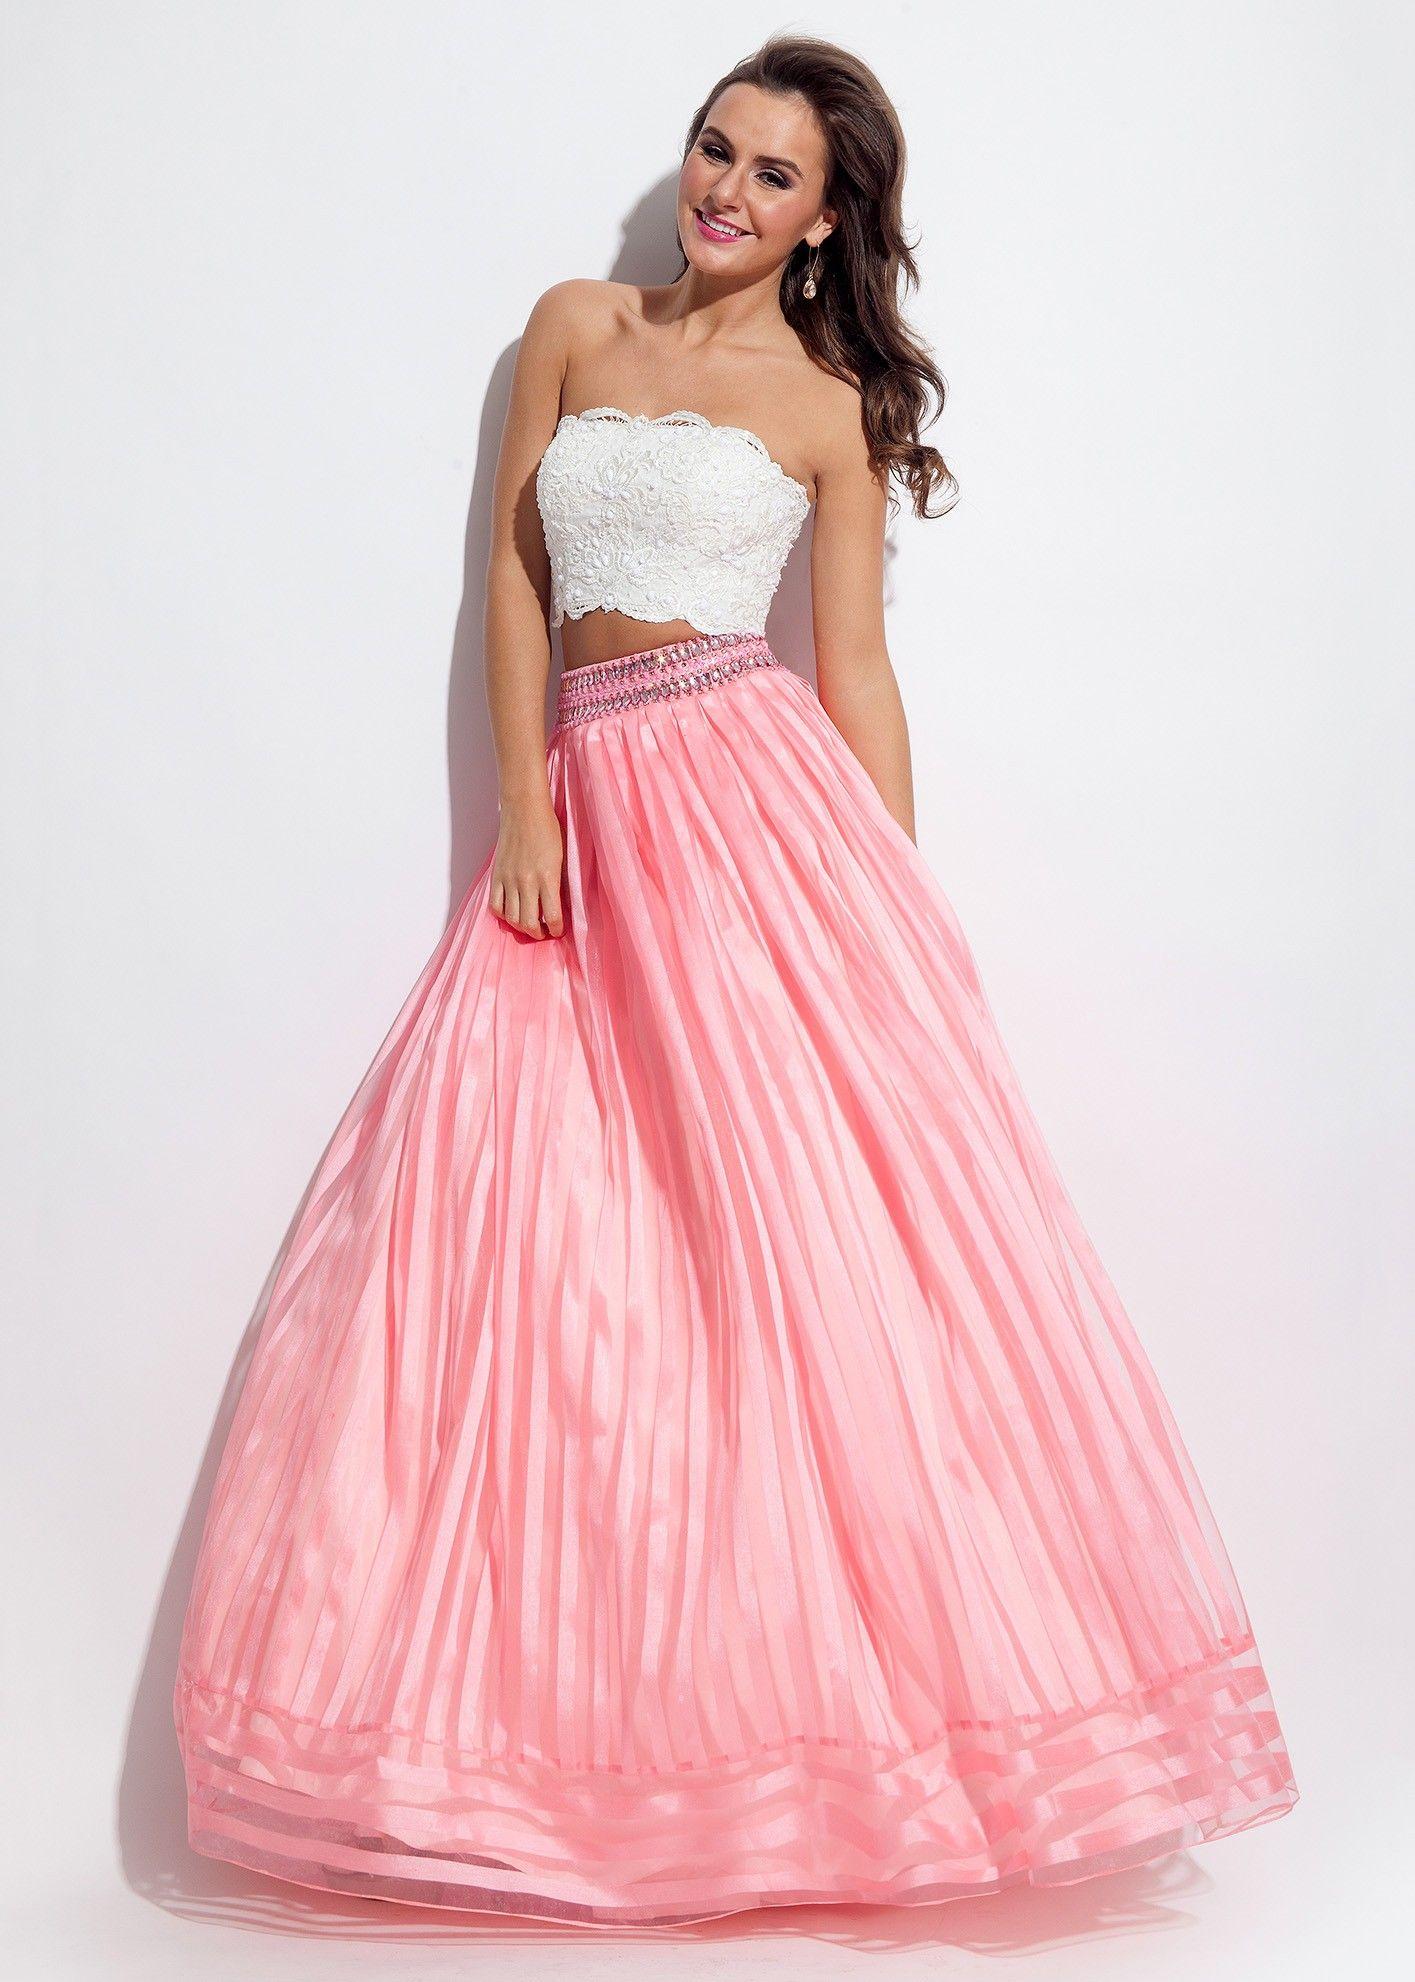 Rachel Allan 7094 White/Coral Beaded Waist Two Piece Ball Gown ...